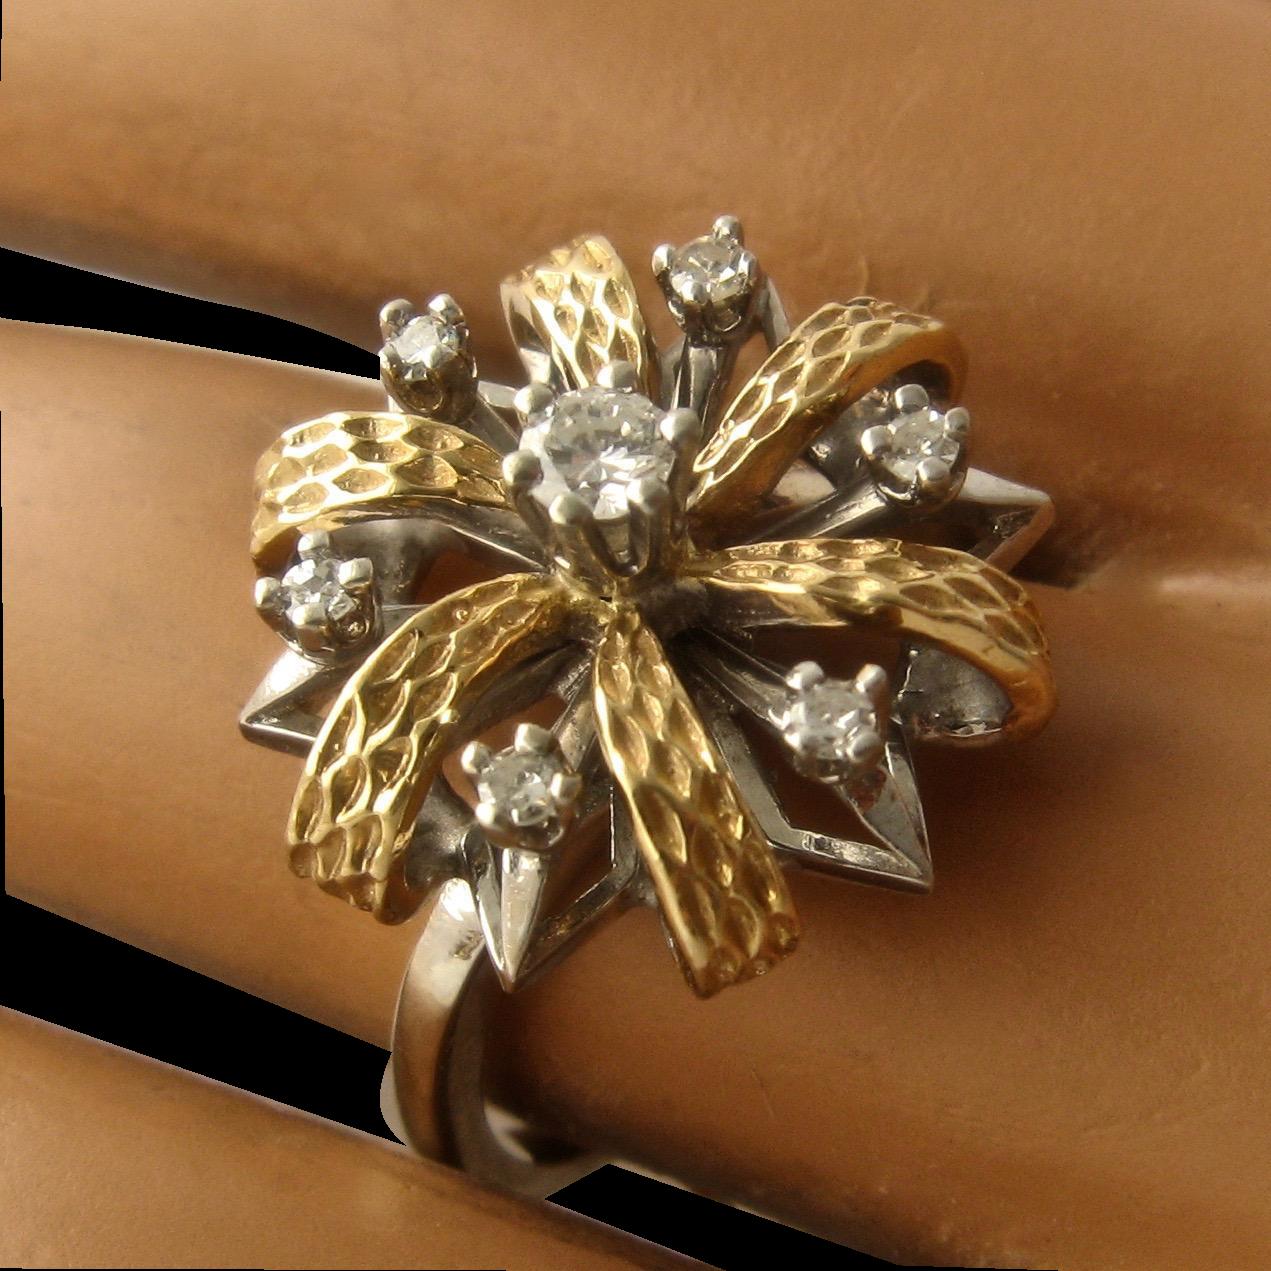 Ca 1950s 14k White Yellow Gold Diamonds Flower Ring By Famor Sz 8